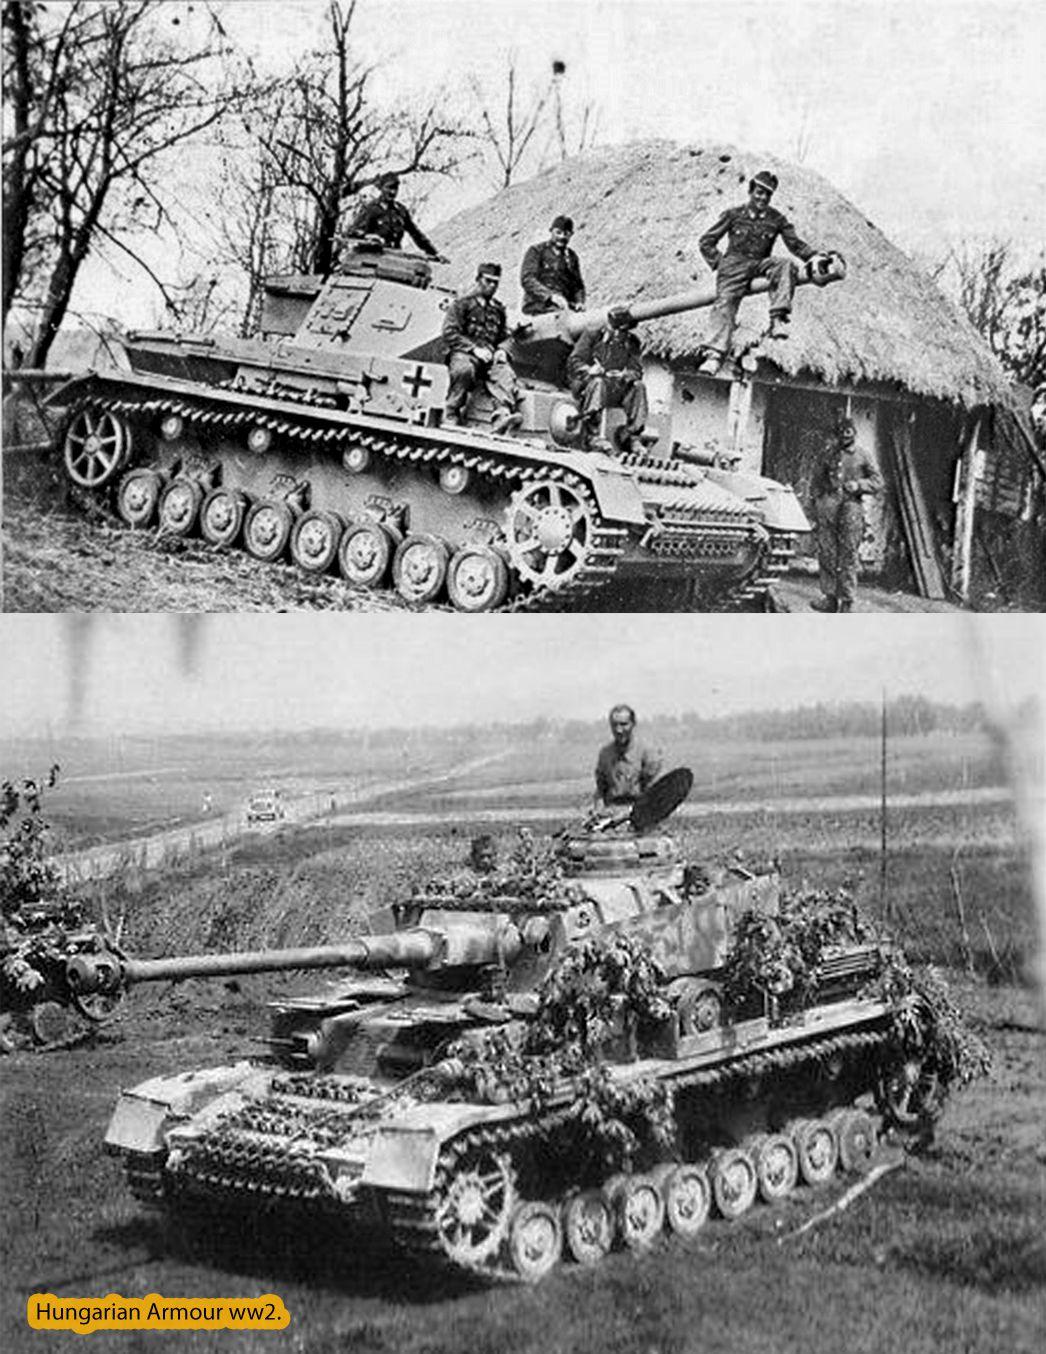 Финляндский фронт оперативные сводки